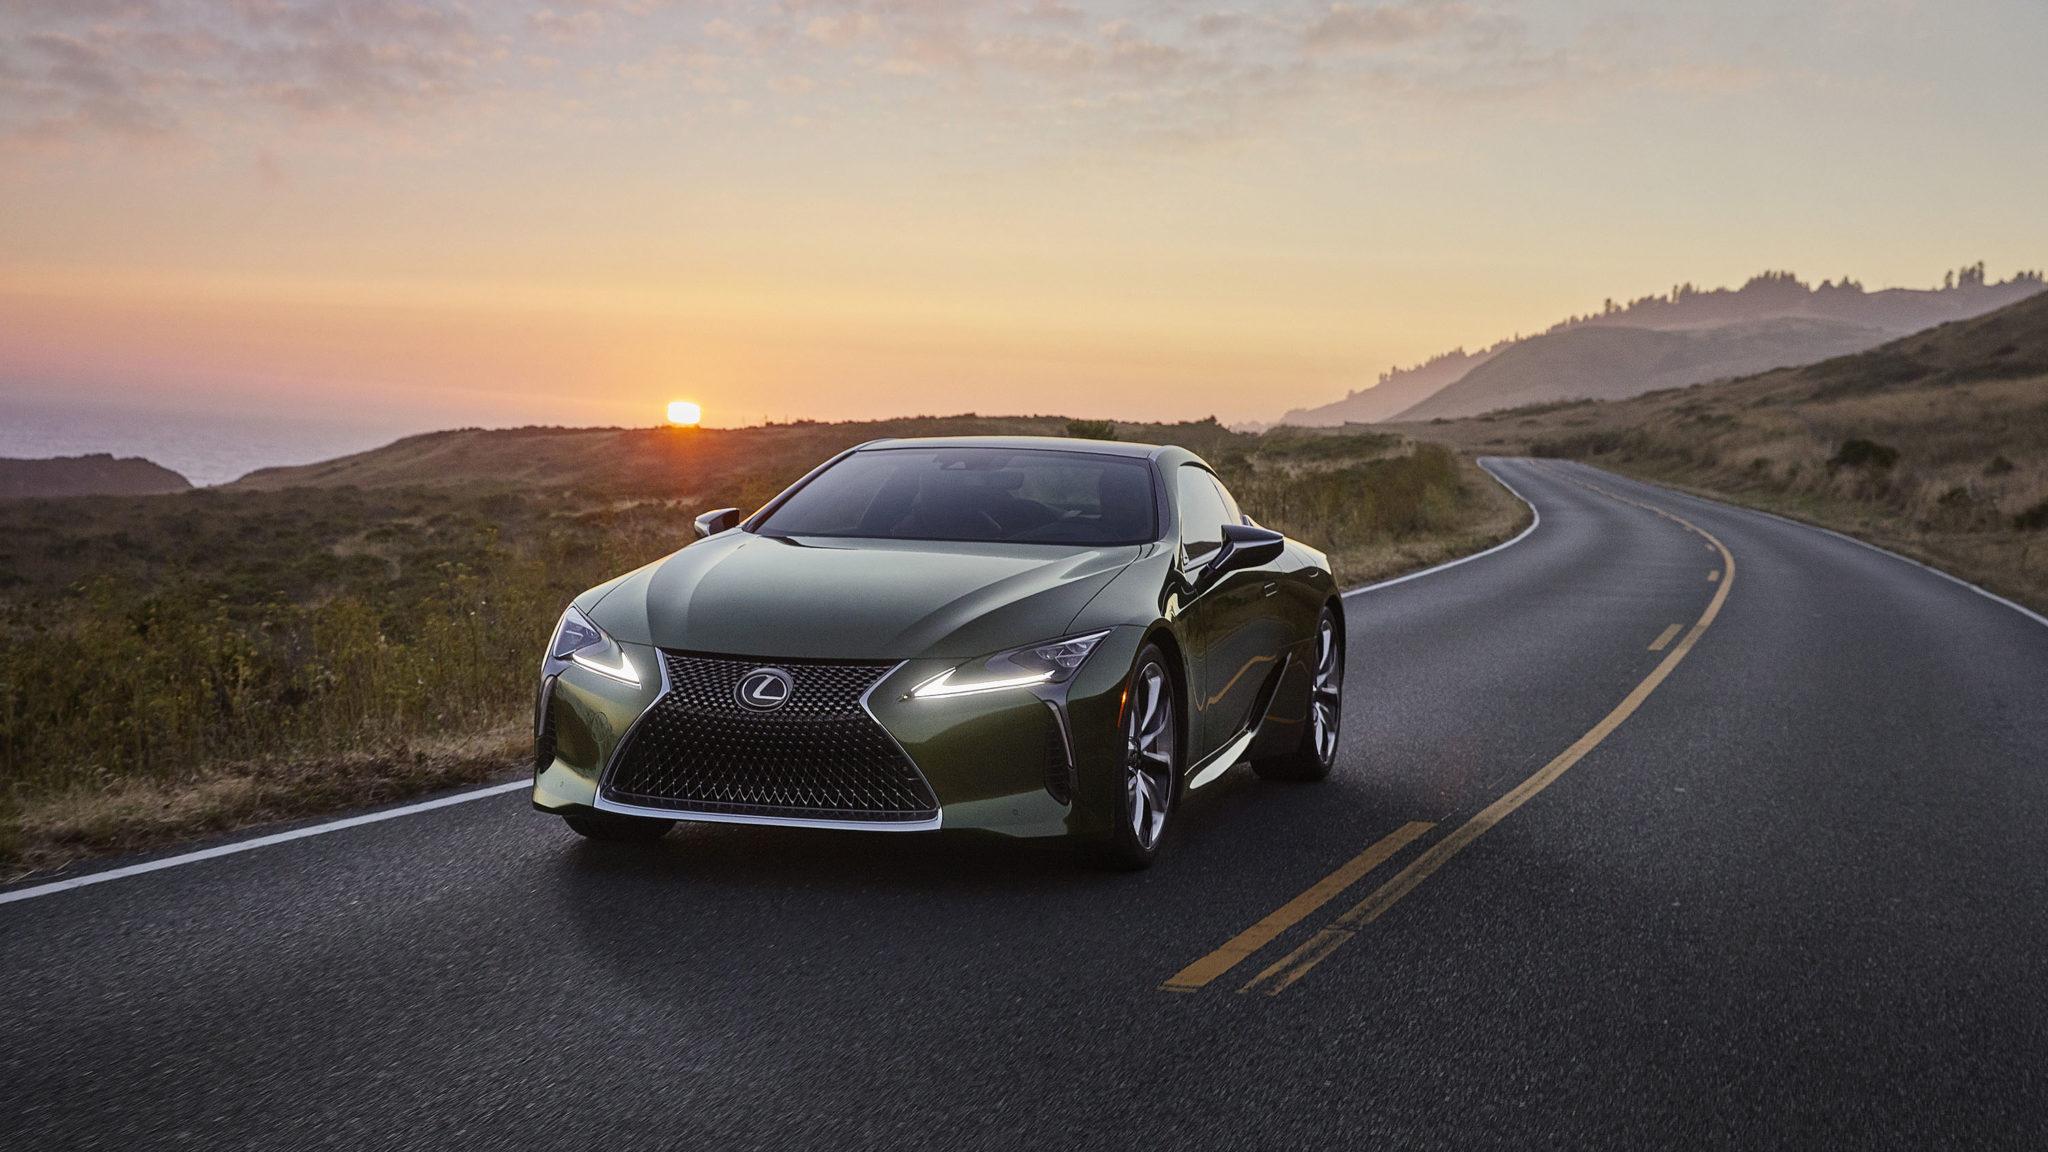 2020 lexus lc 500 inspiration series goes green